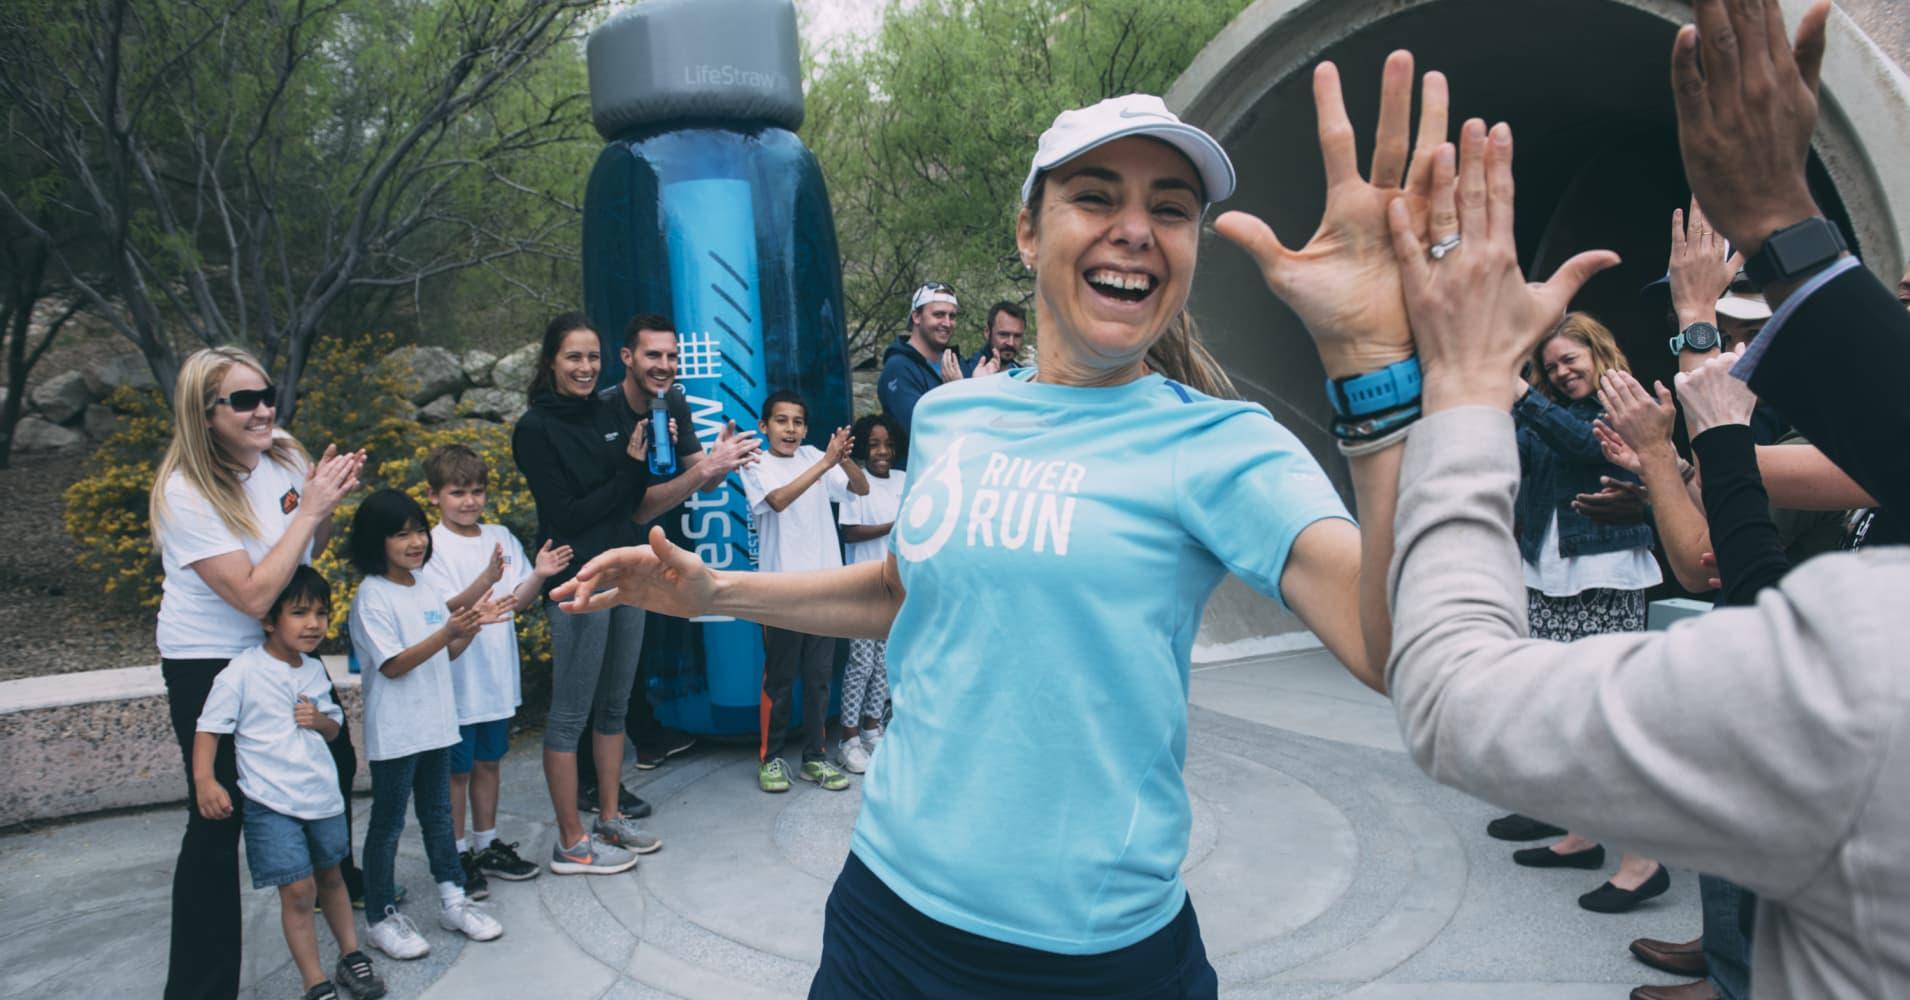 Mina Guli, Thirst founder and CEO, plans to run 100 marathons in 100 days